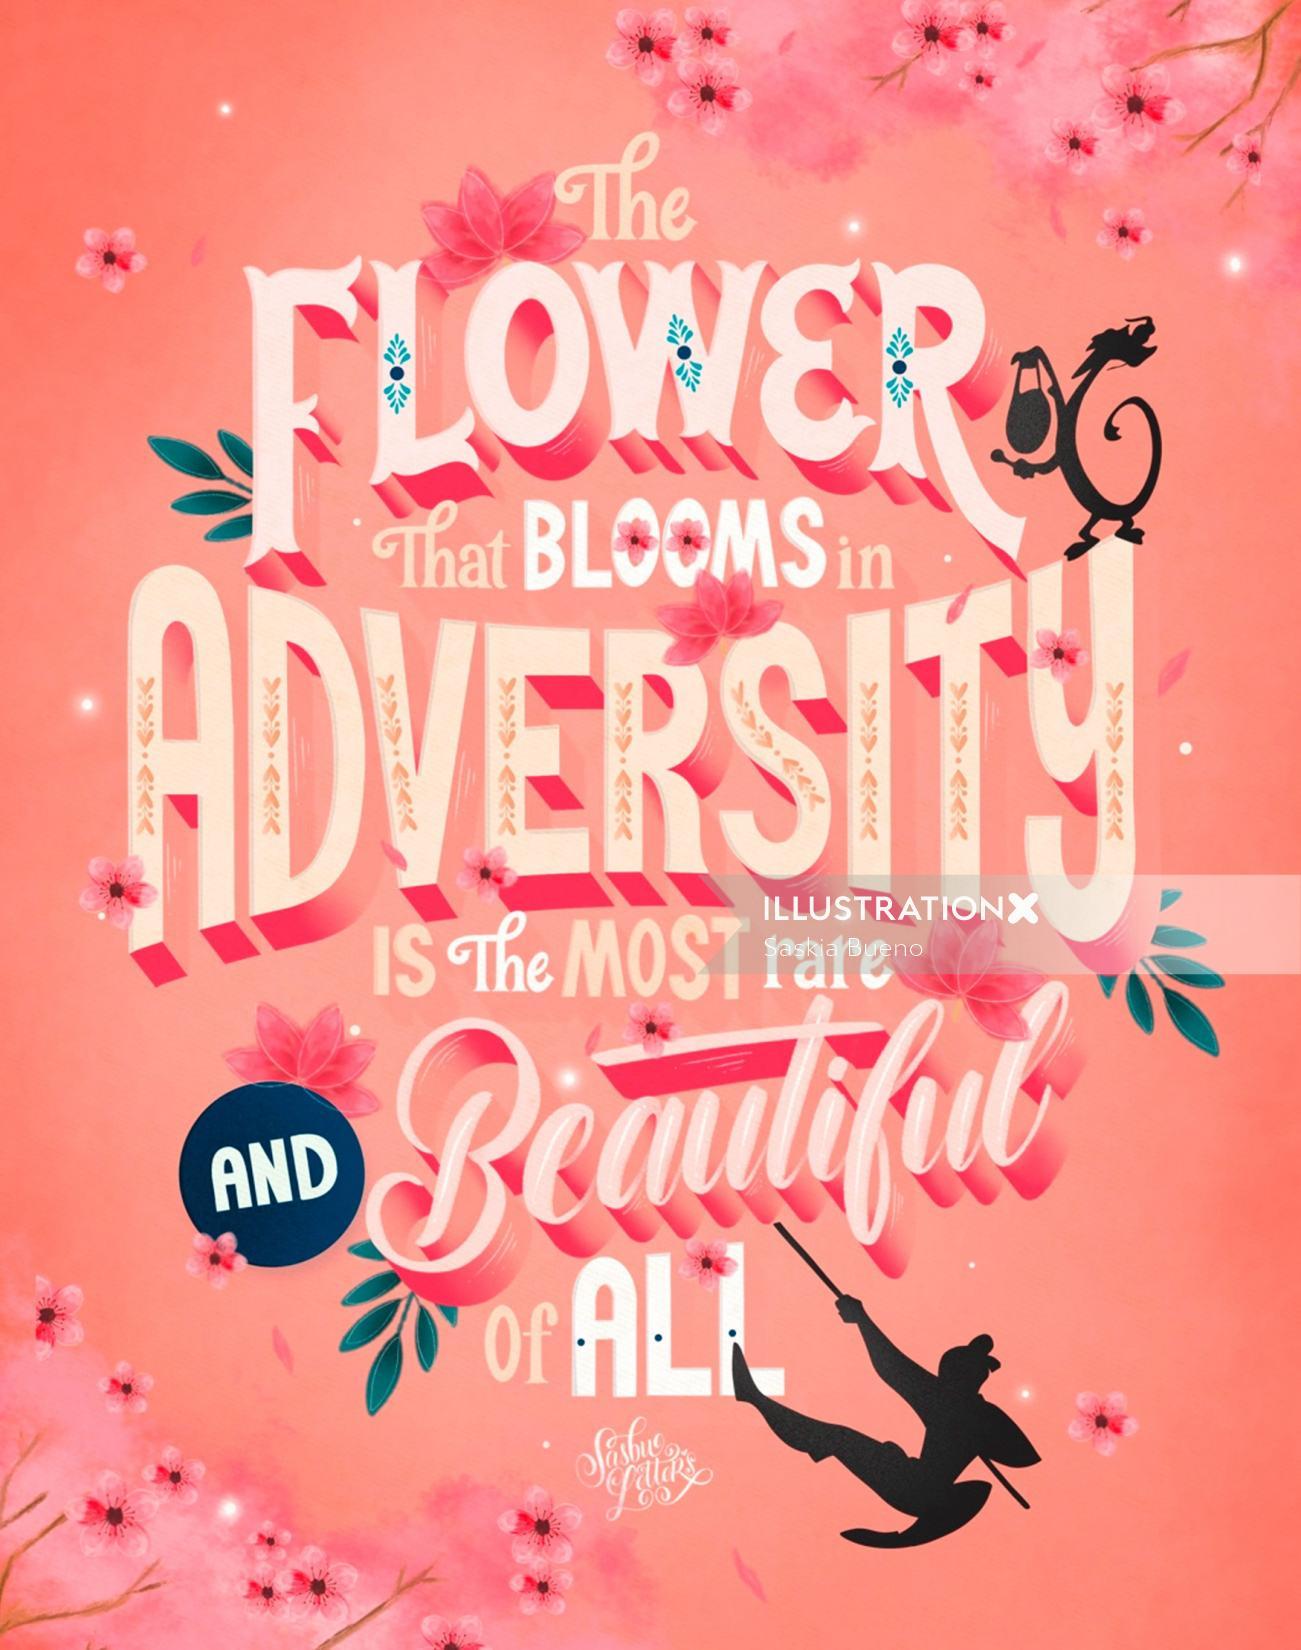 Lettering art of  Flower That Blooms In Adversity